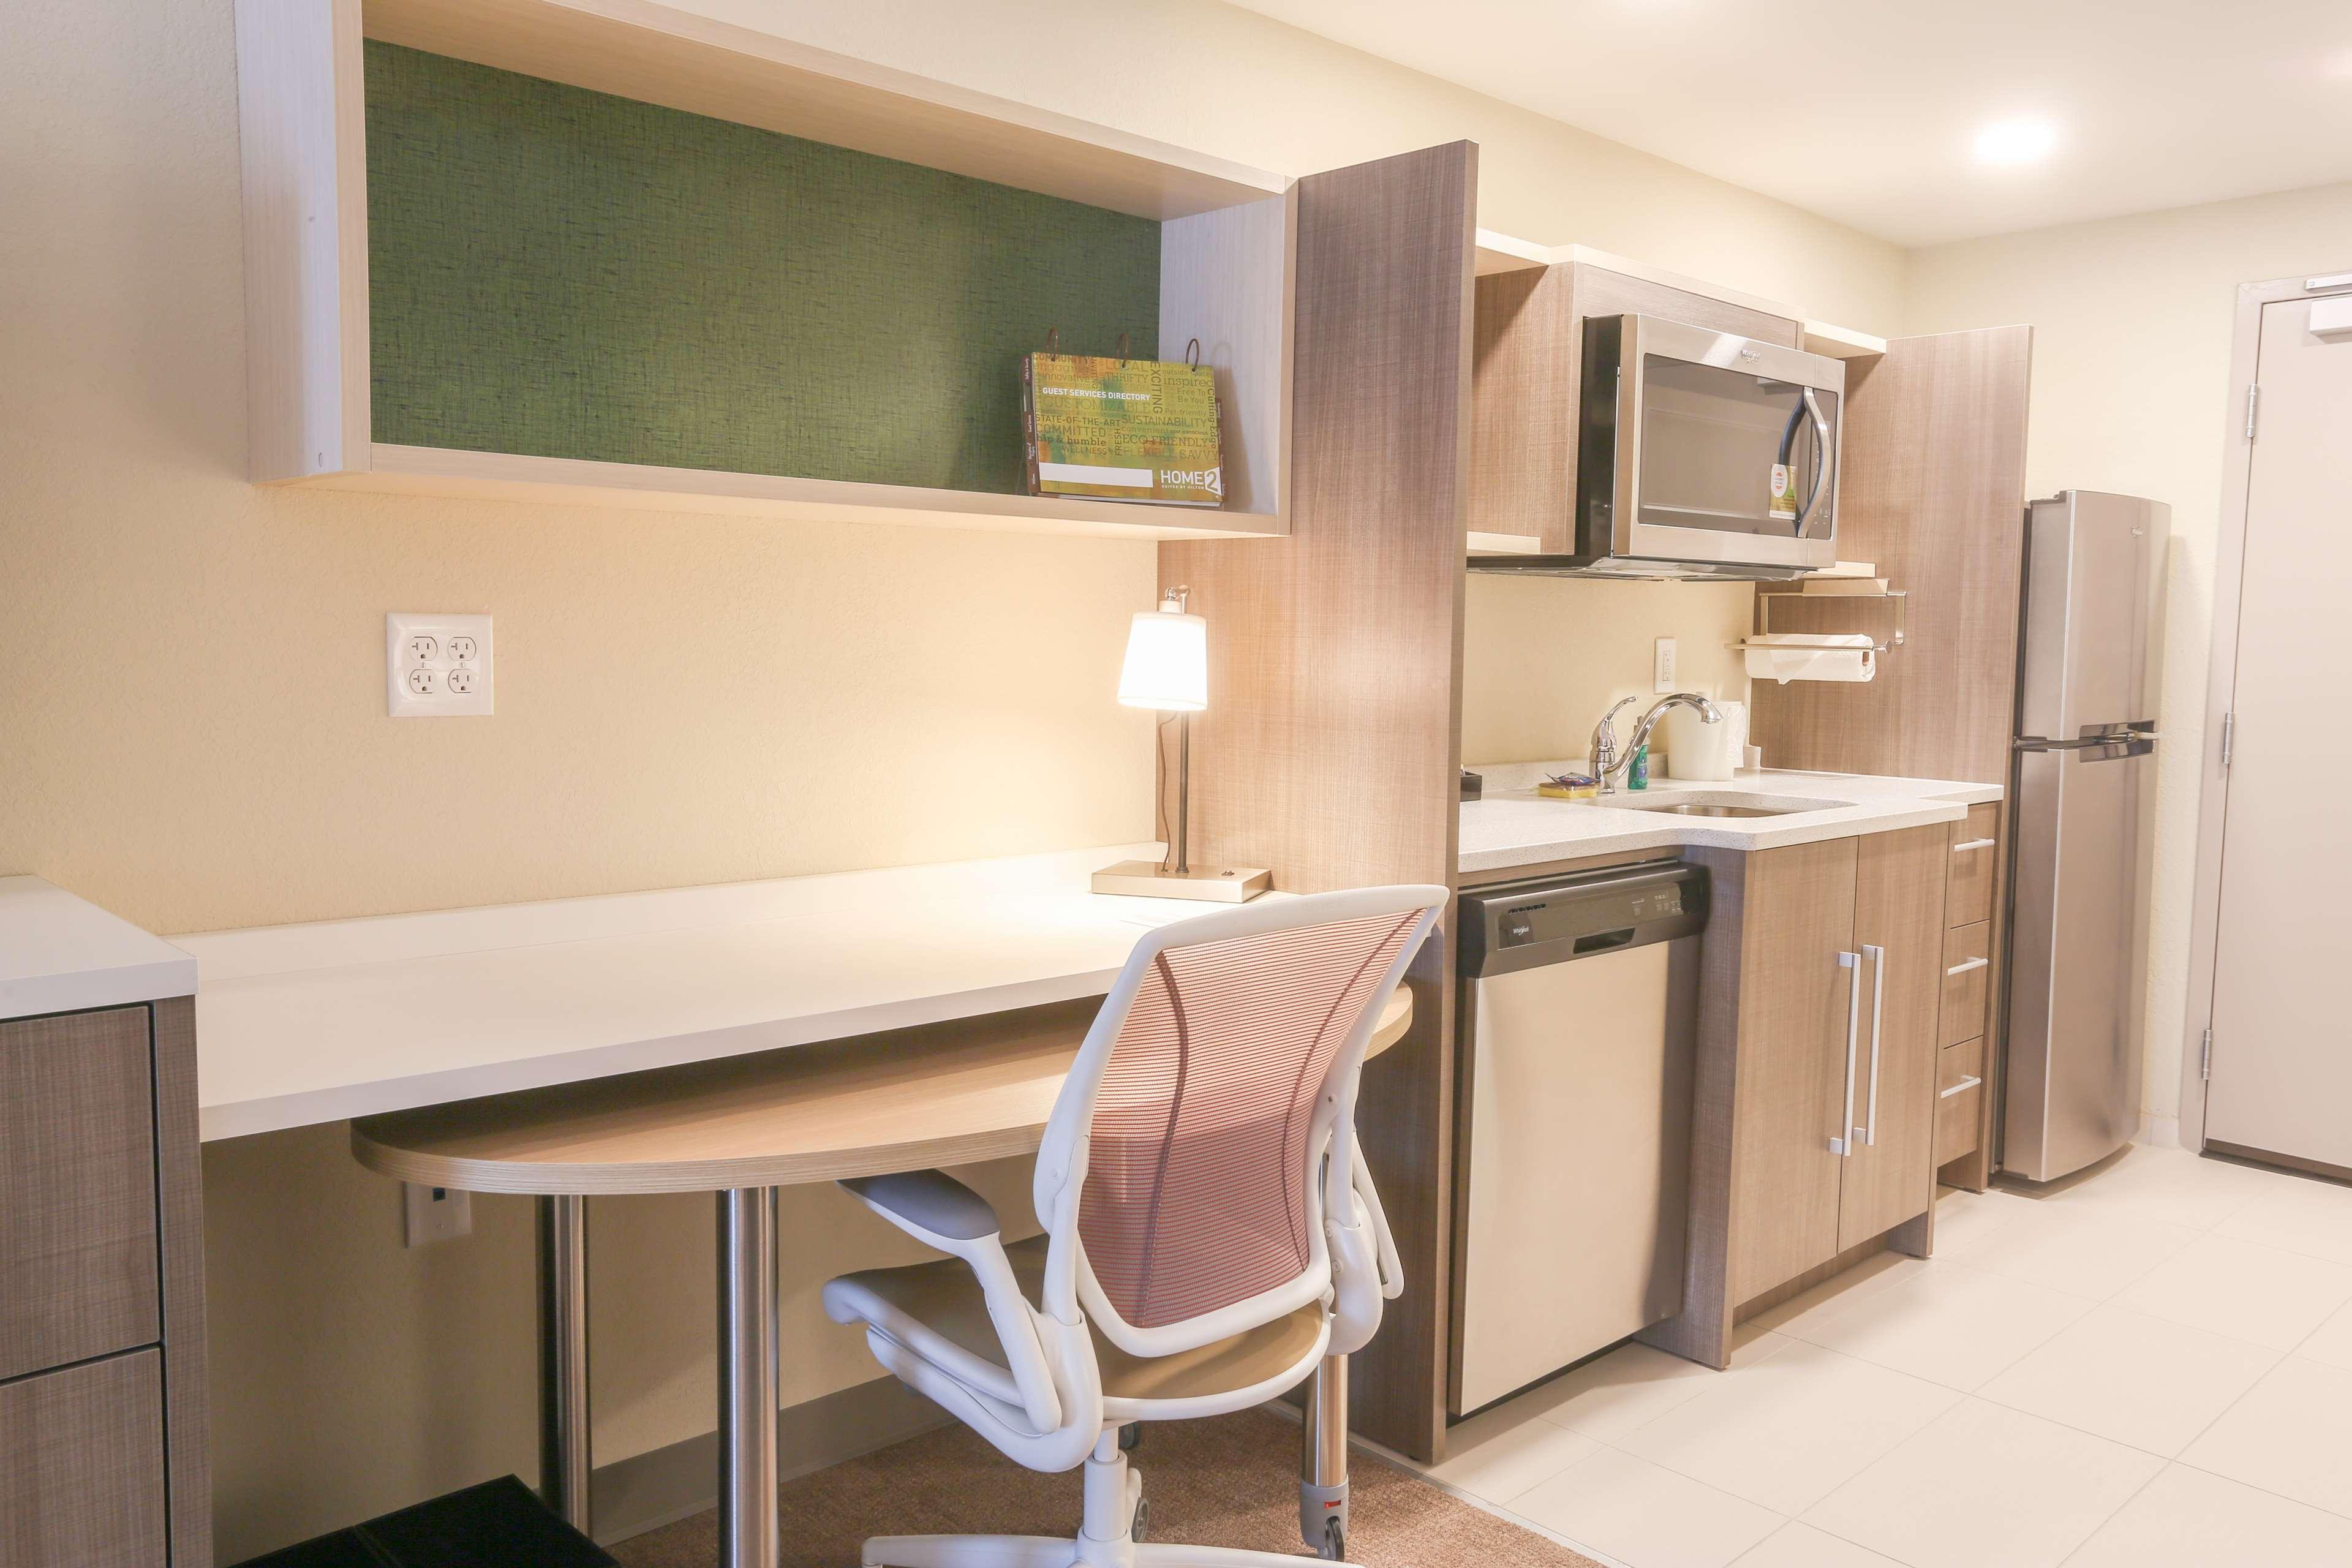 Home2 Suites by Hilton Bordentown image 26